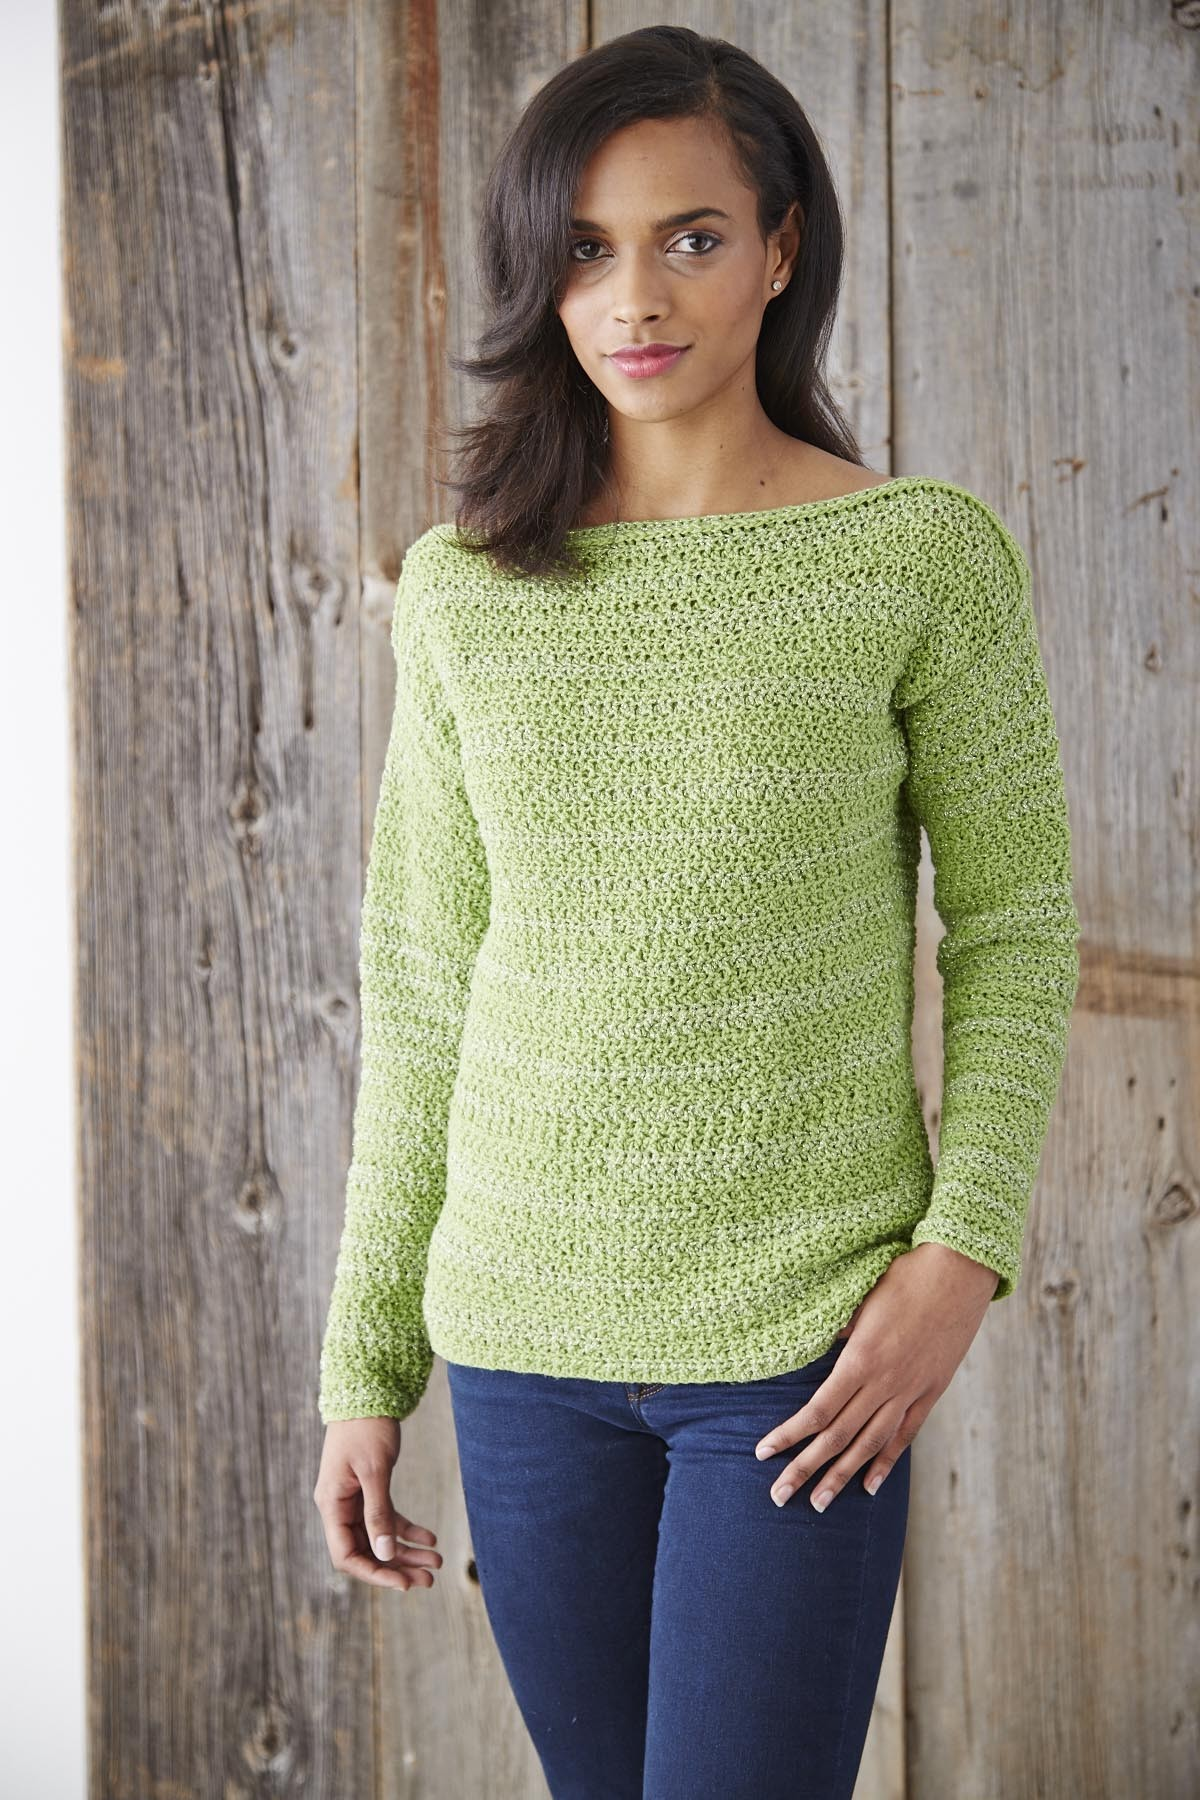 crochet sweater patterns slouchy crochet cardigan. boat neck pullover gjihelm